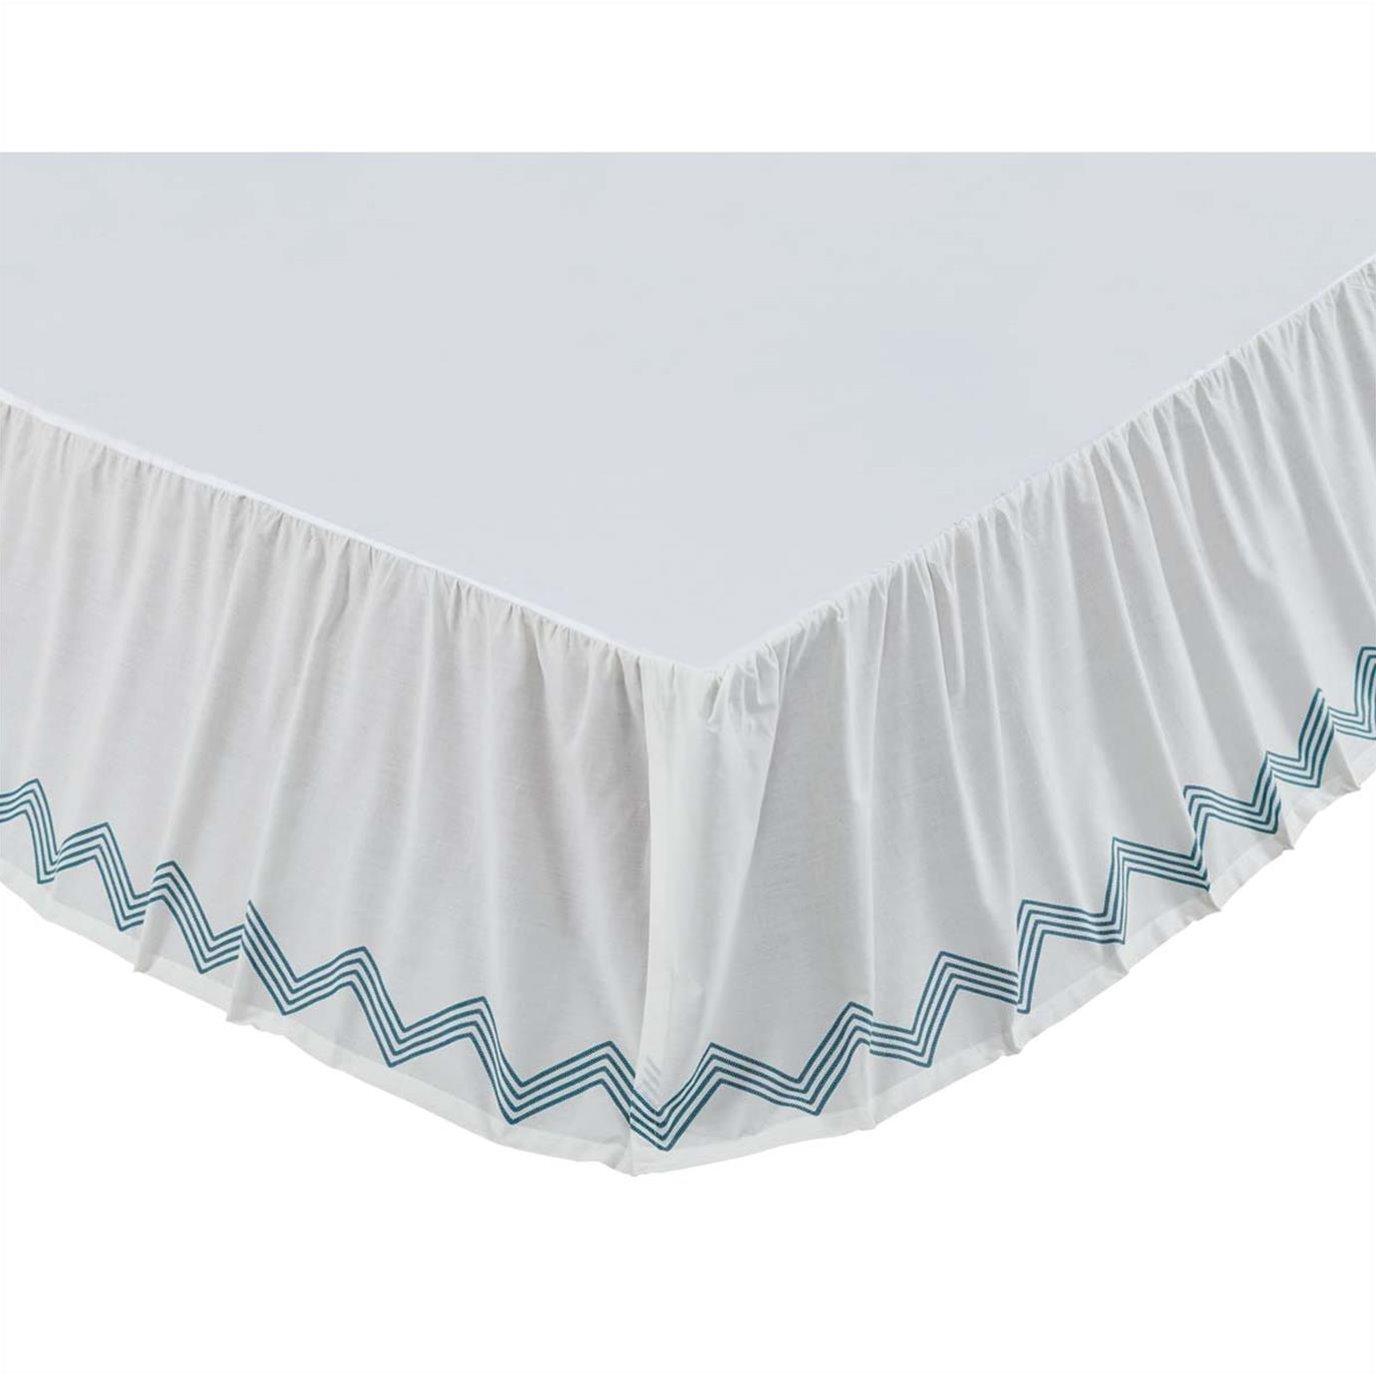 Laguna King Bed Skirt 78x80x16